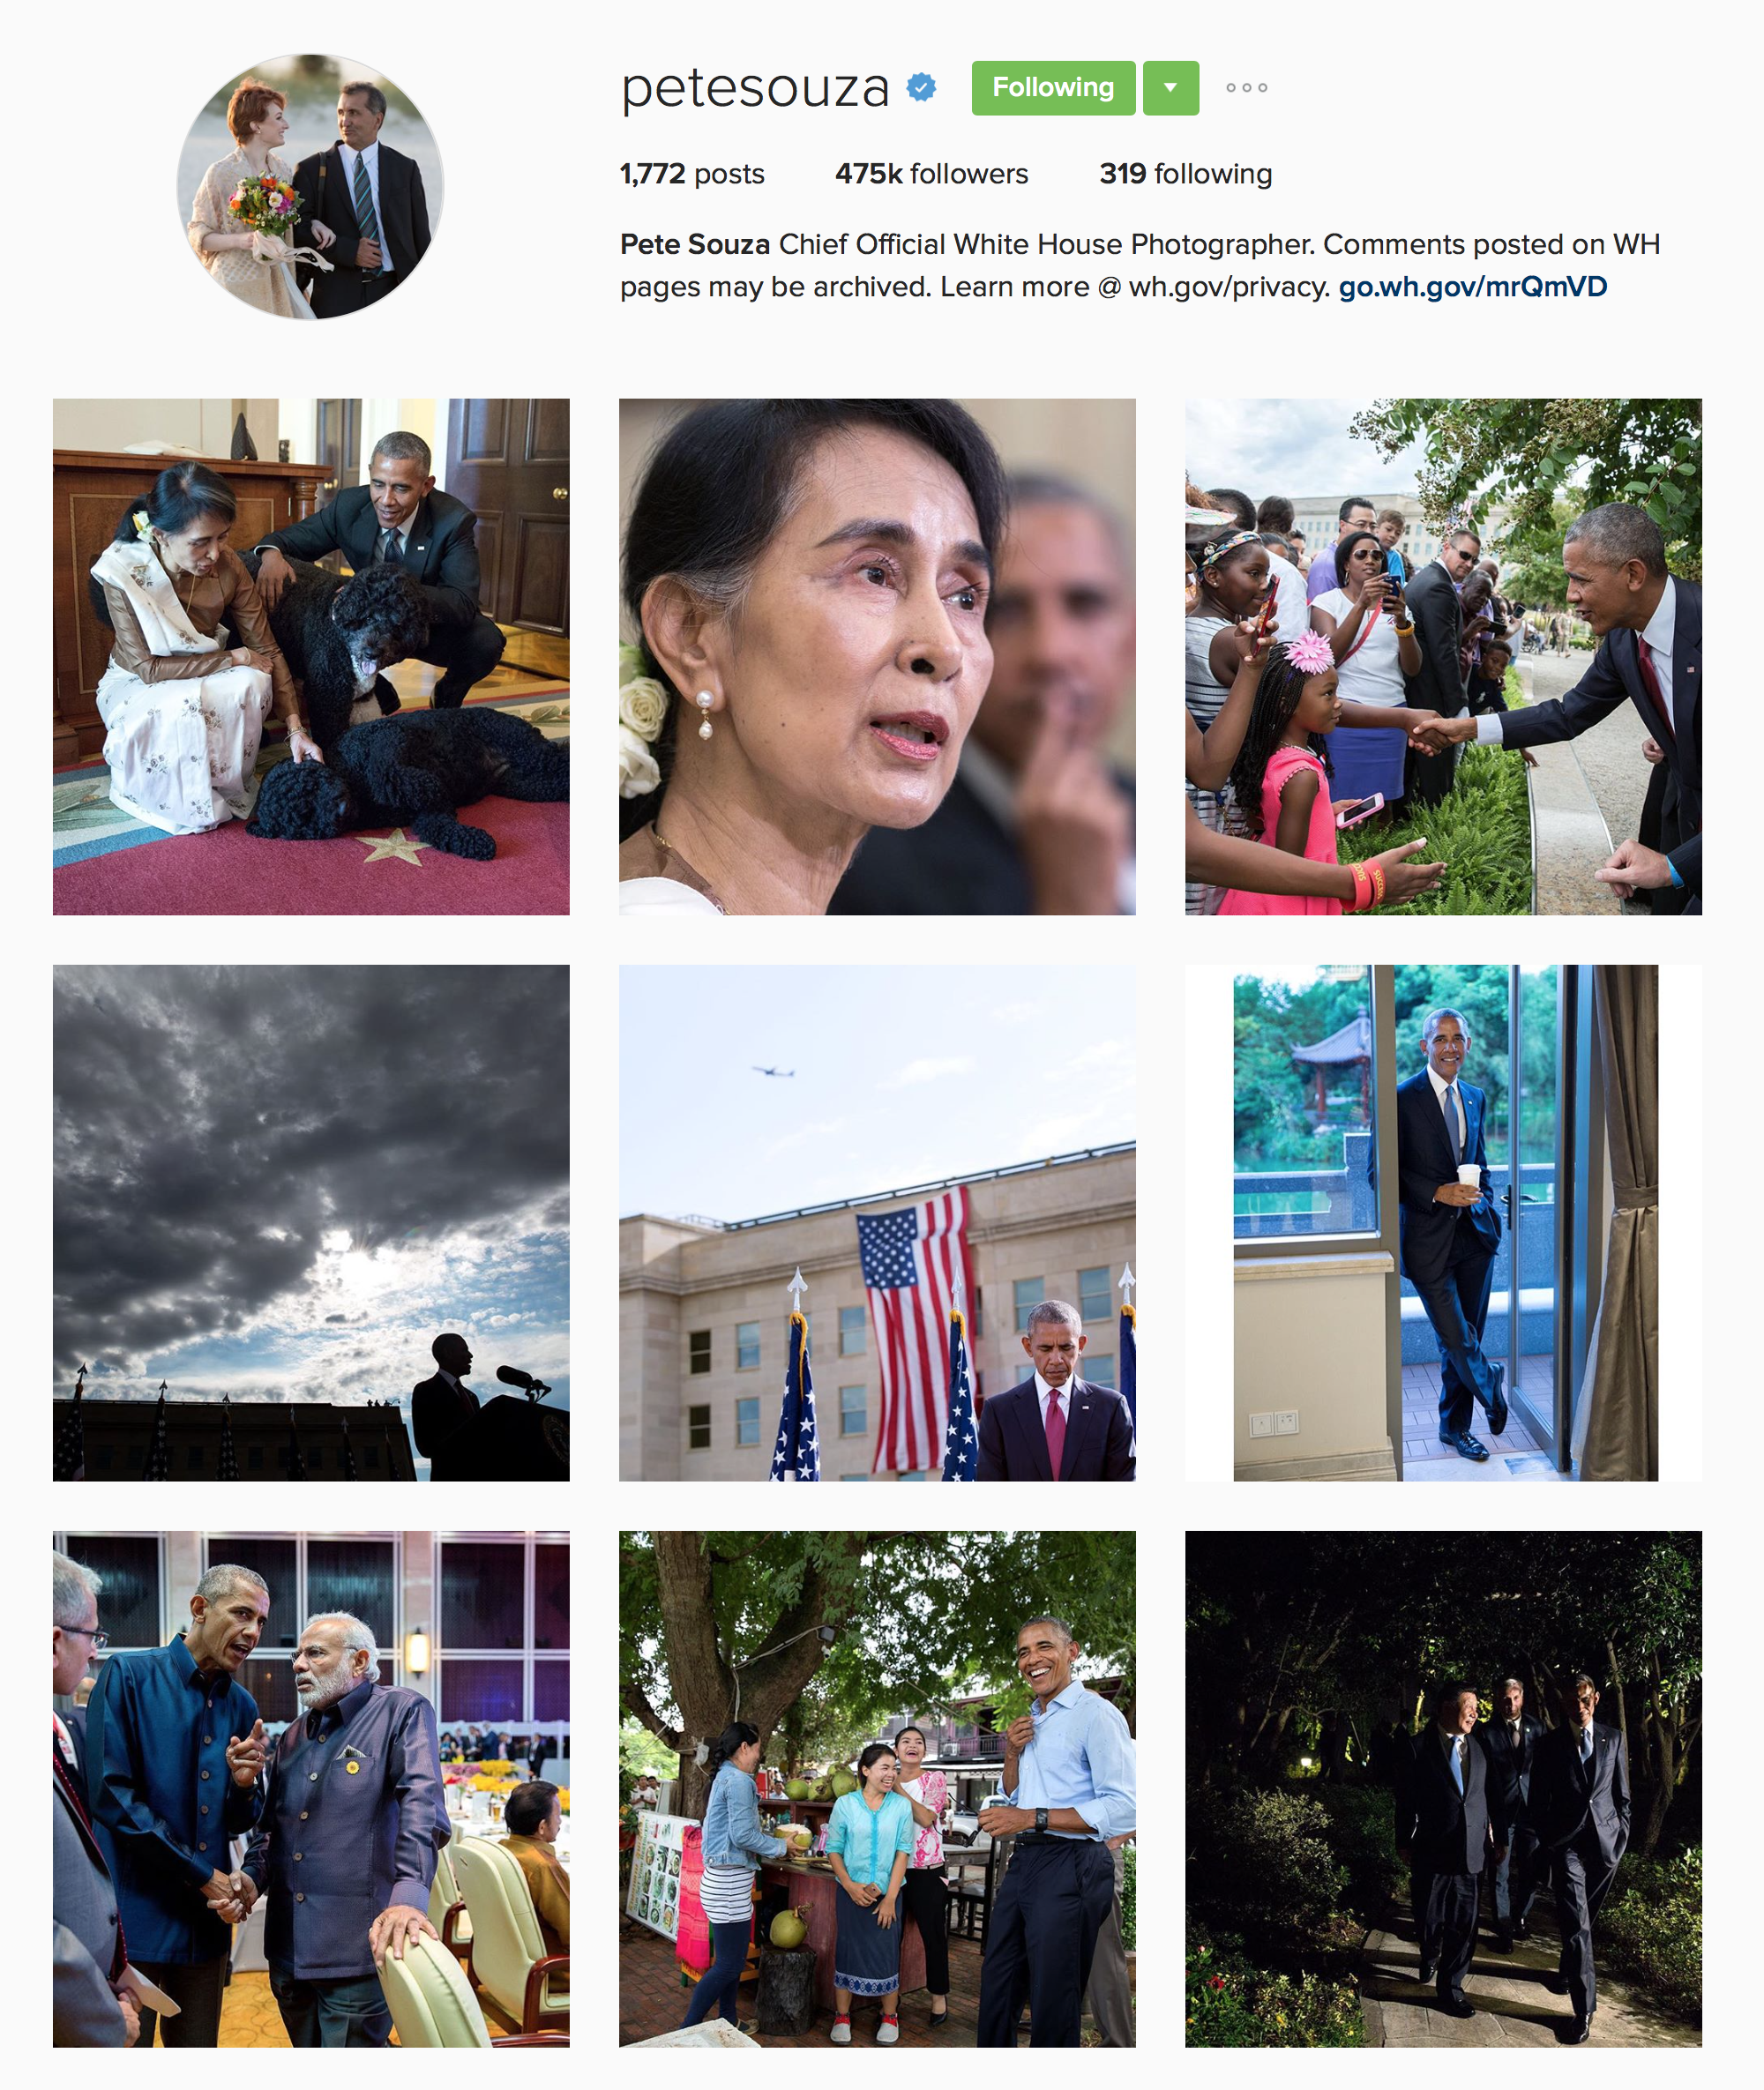 Pete Souza on Instagram